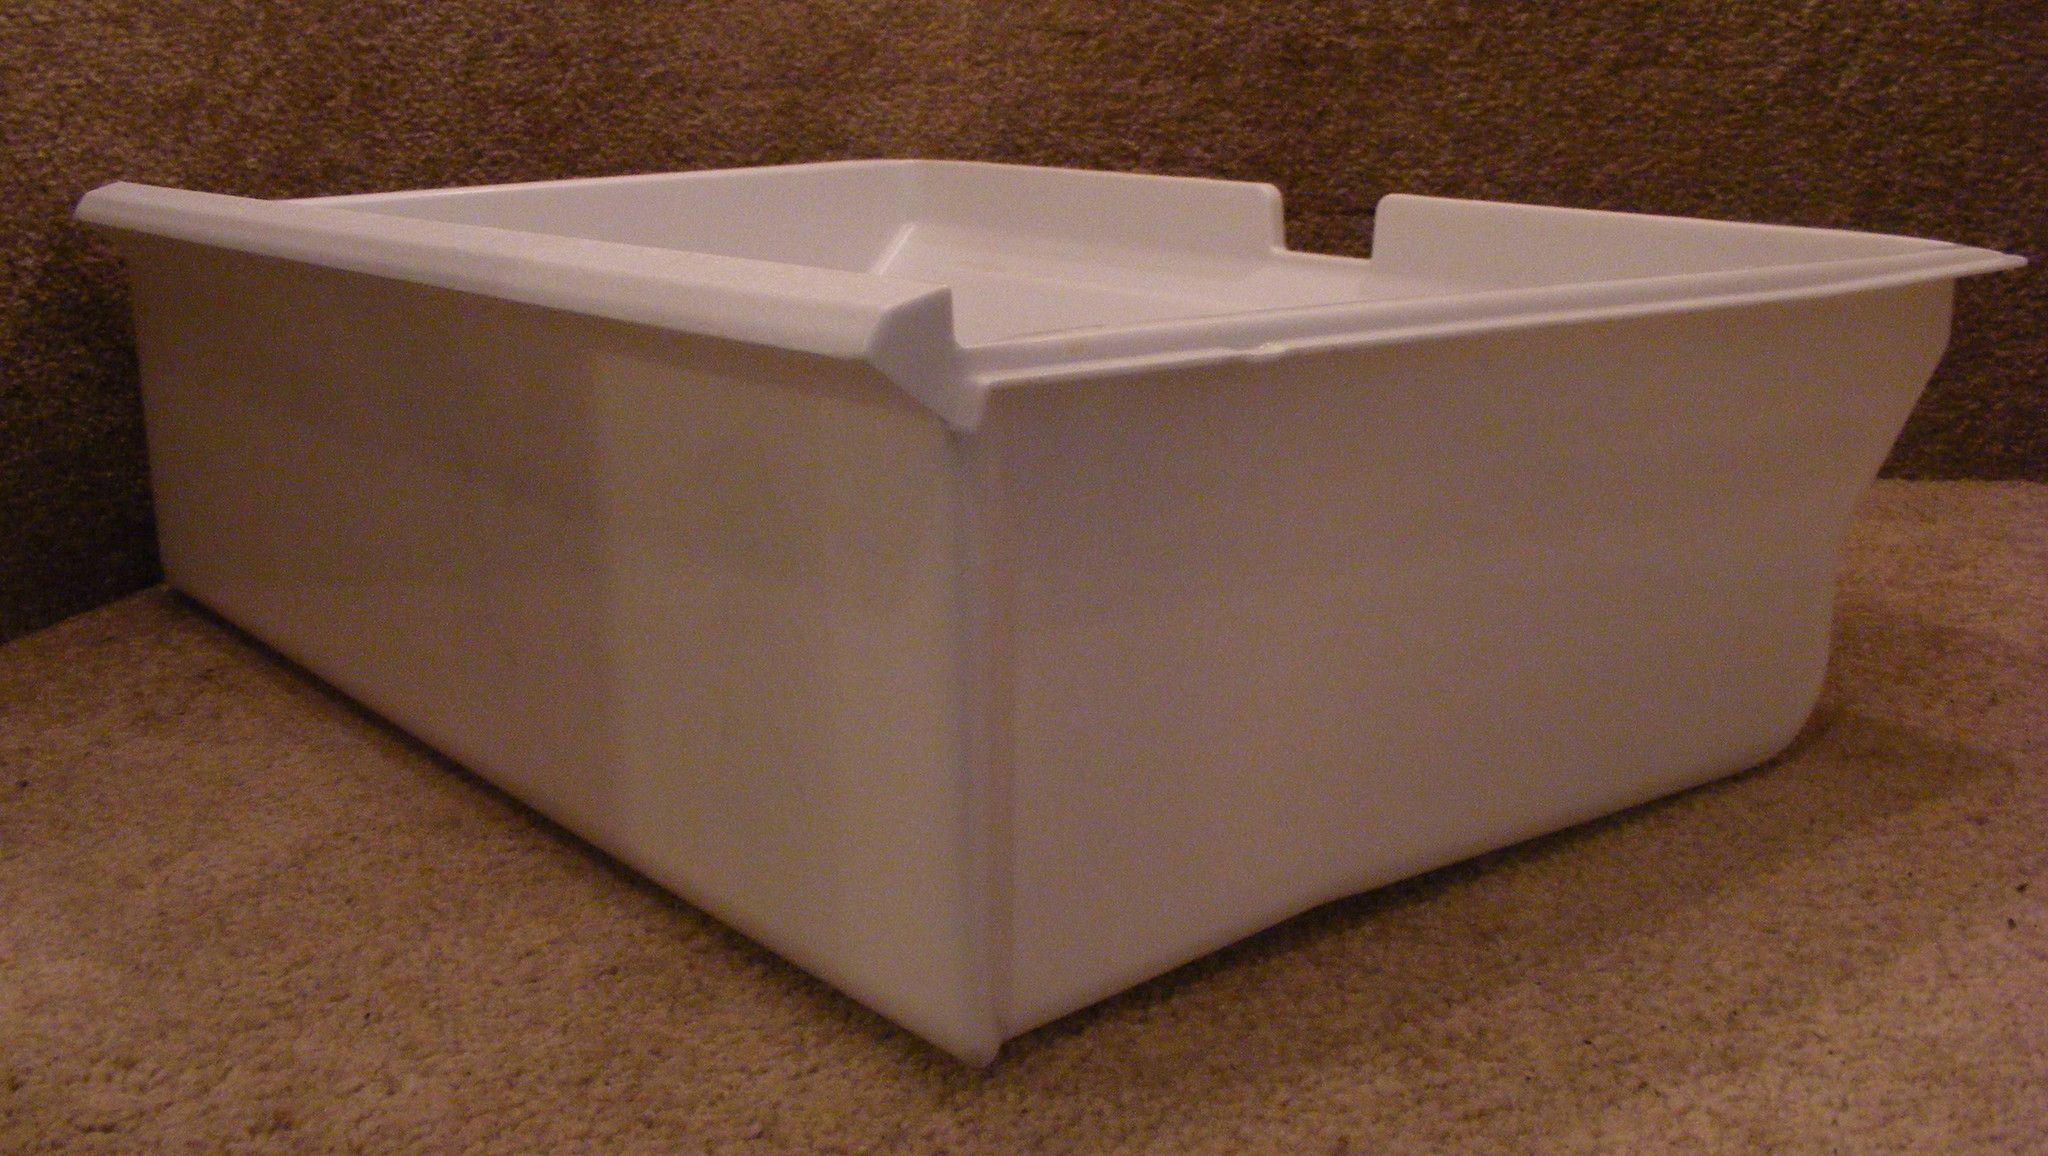 WR32X1181 GE Refrigerator Full Crisper Pan Drawer